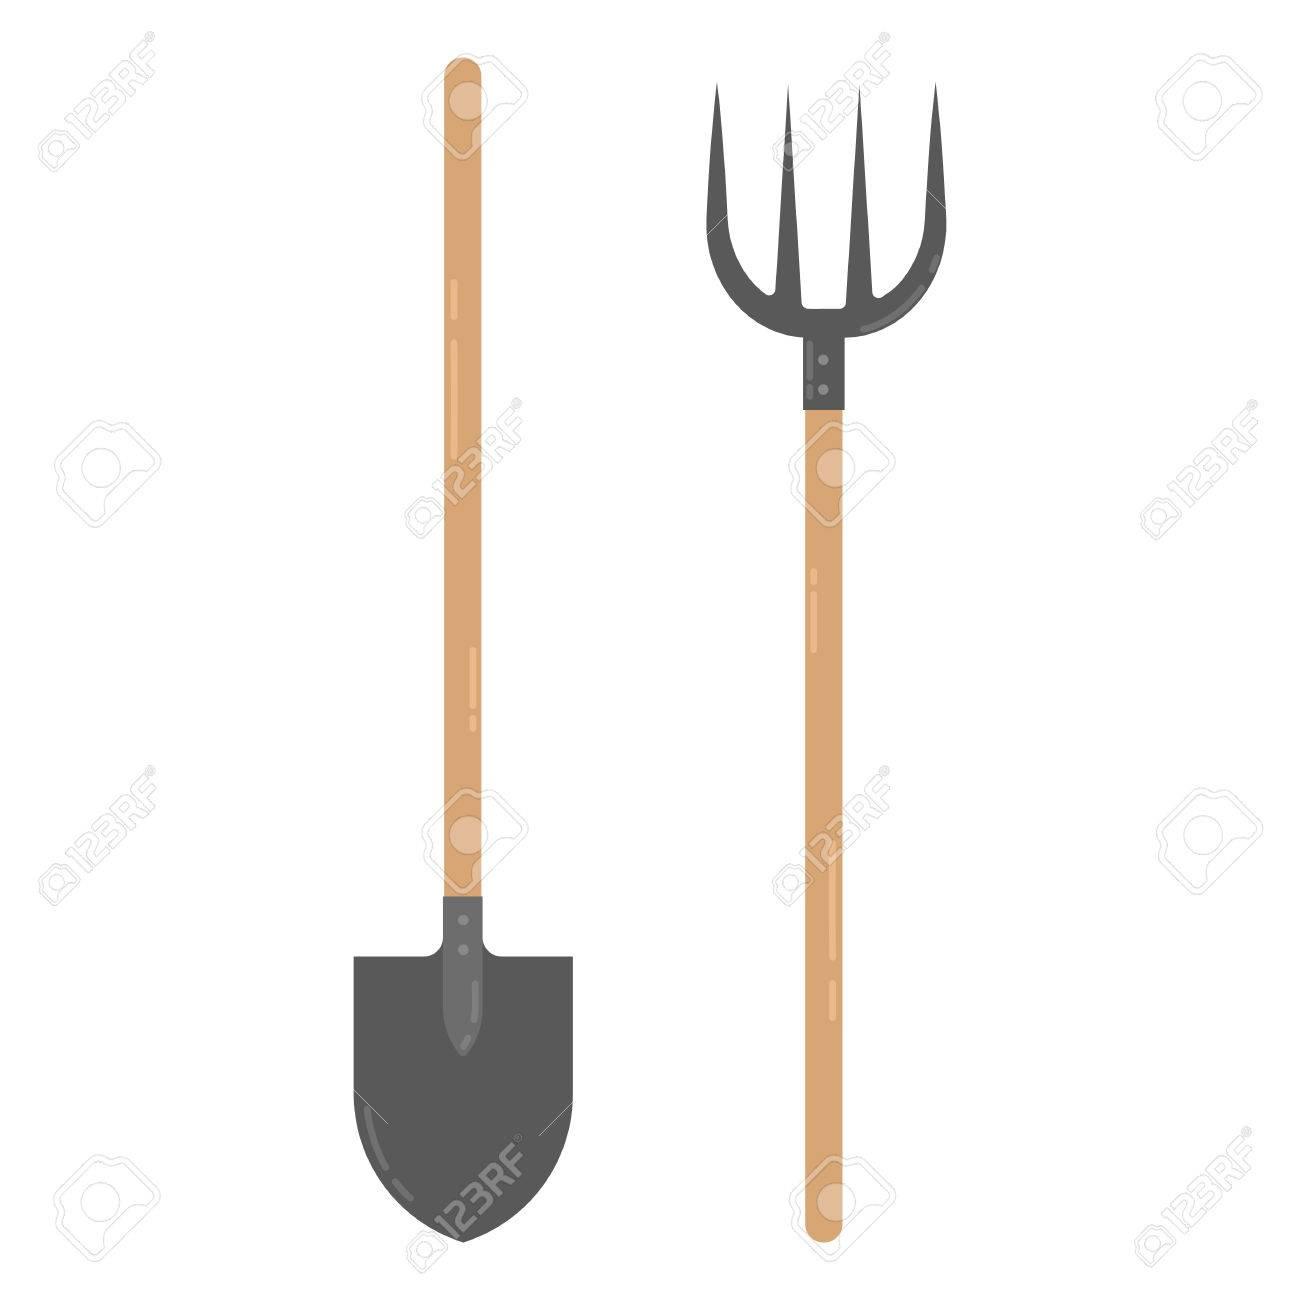 farmers shovel and pitchfork royalty free cliparts vectors and rh 123rf com Devil Clip Art Chicken Clip Art